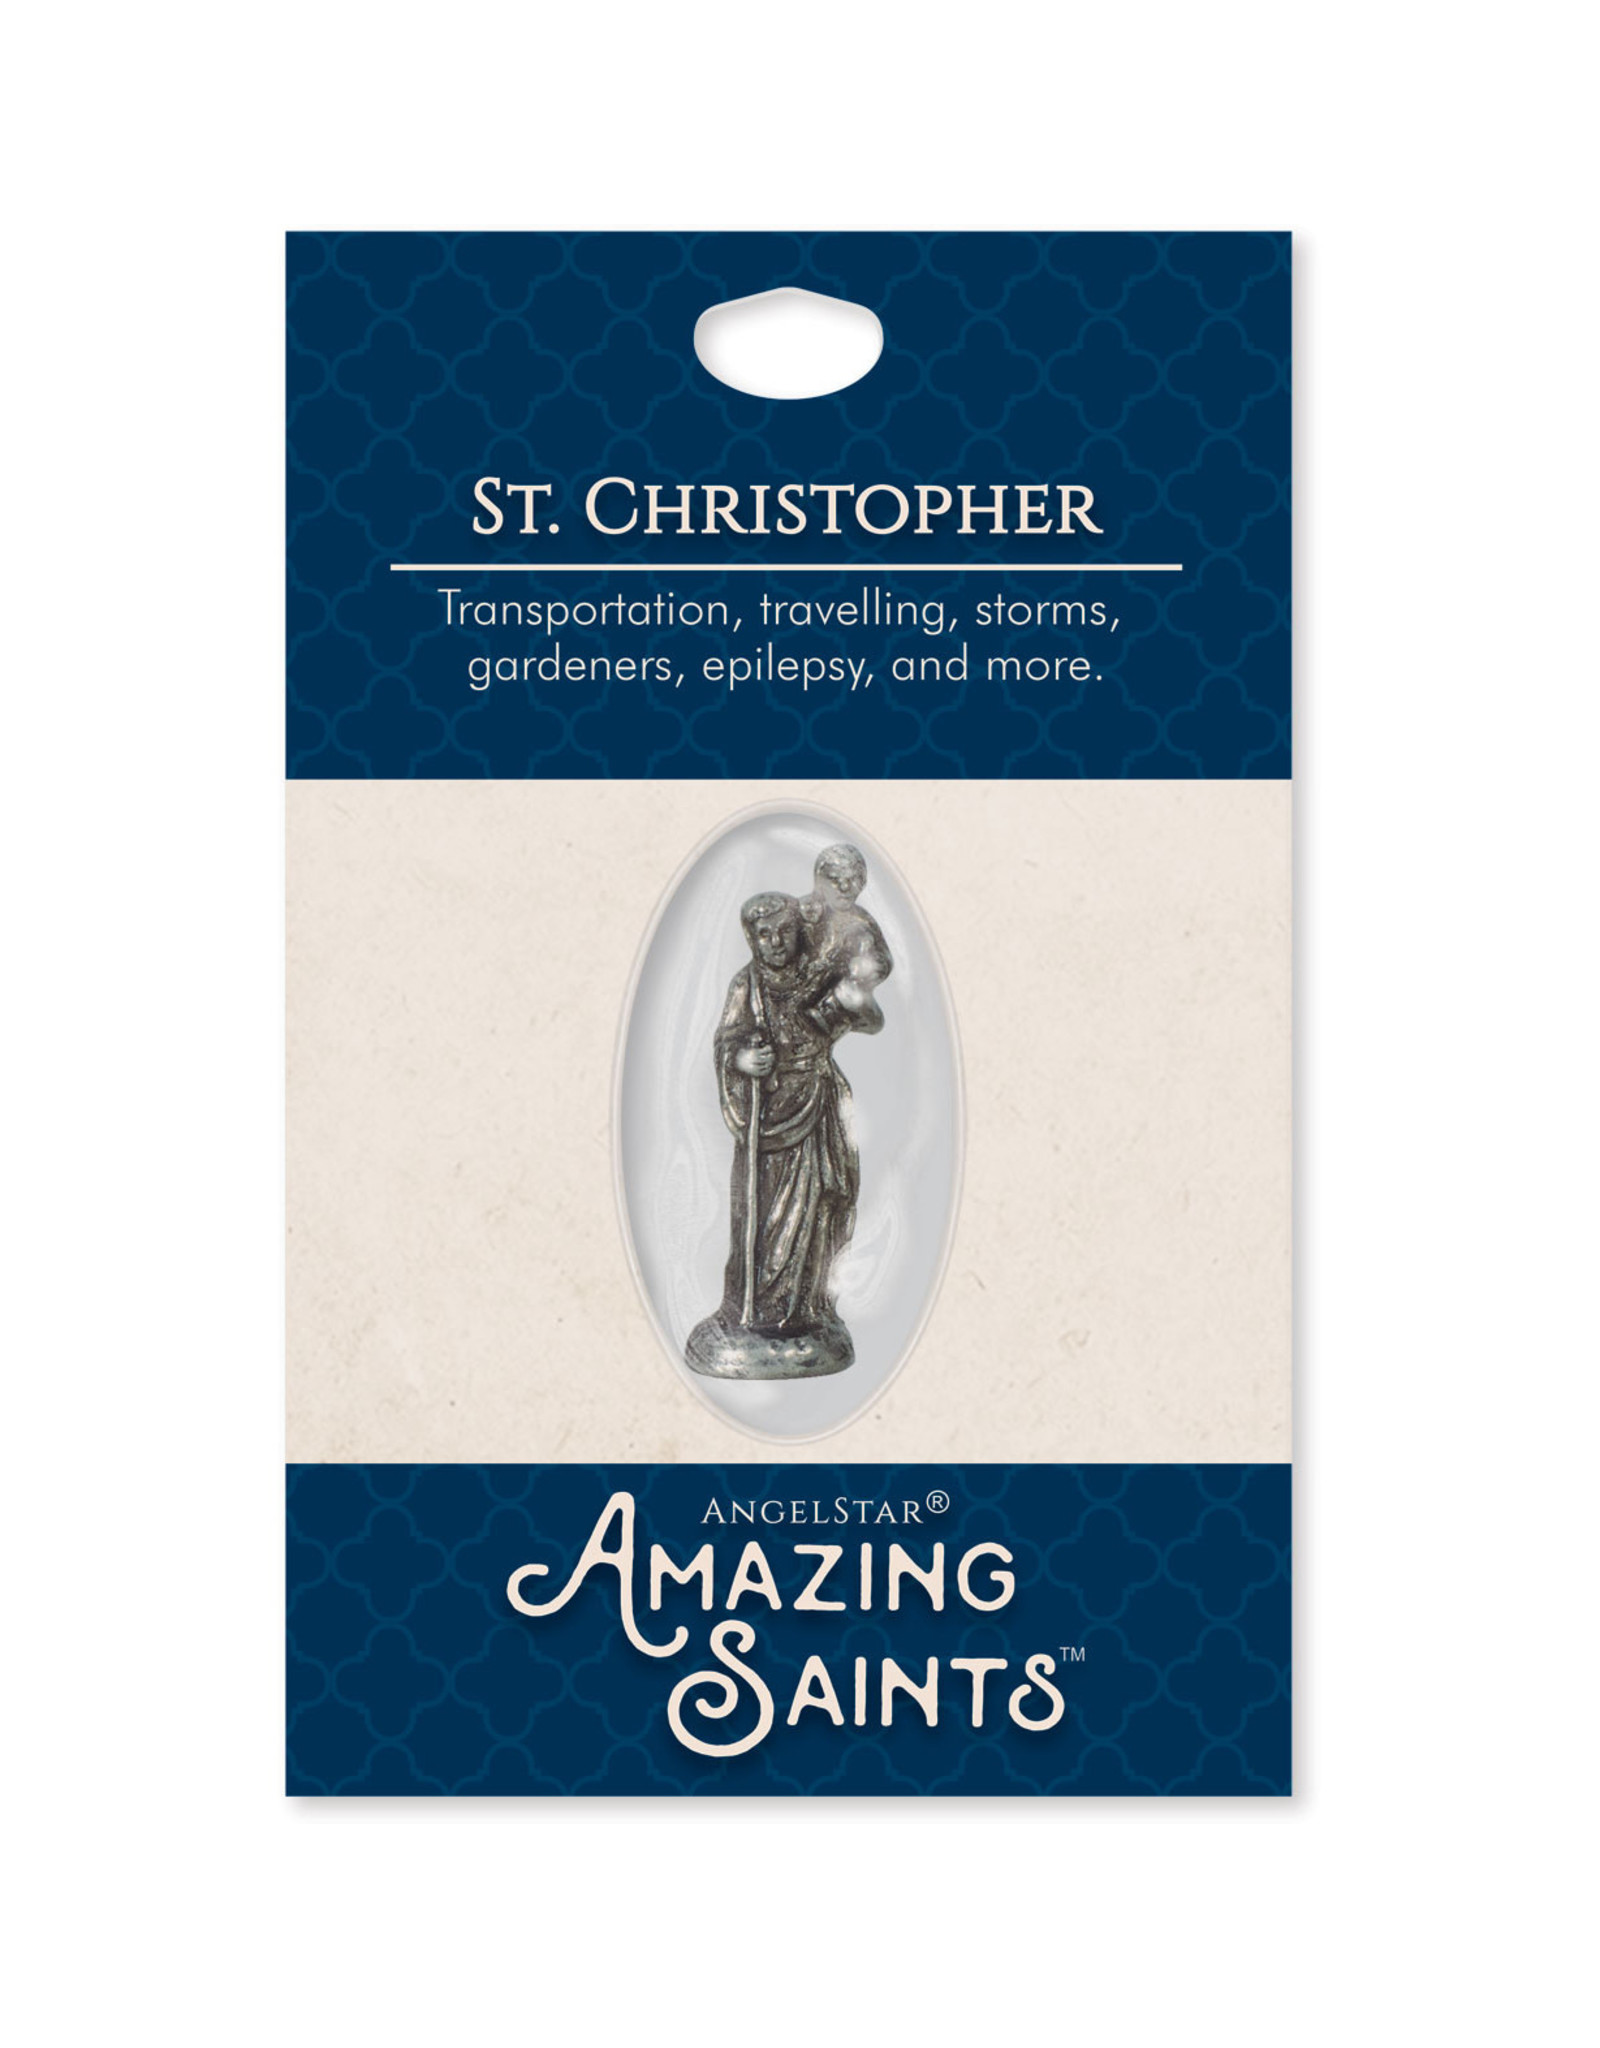 Amazing Saints - St. Christopher